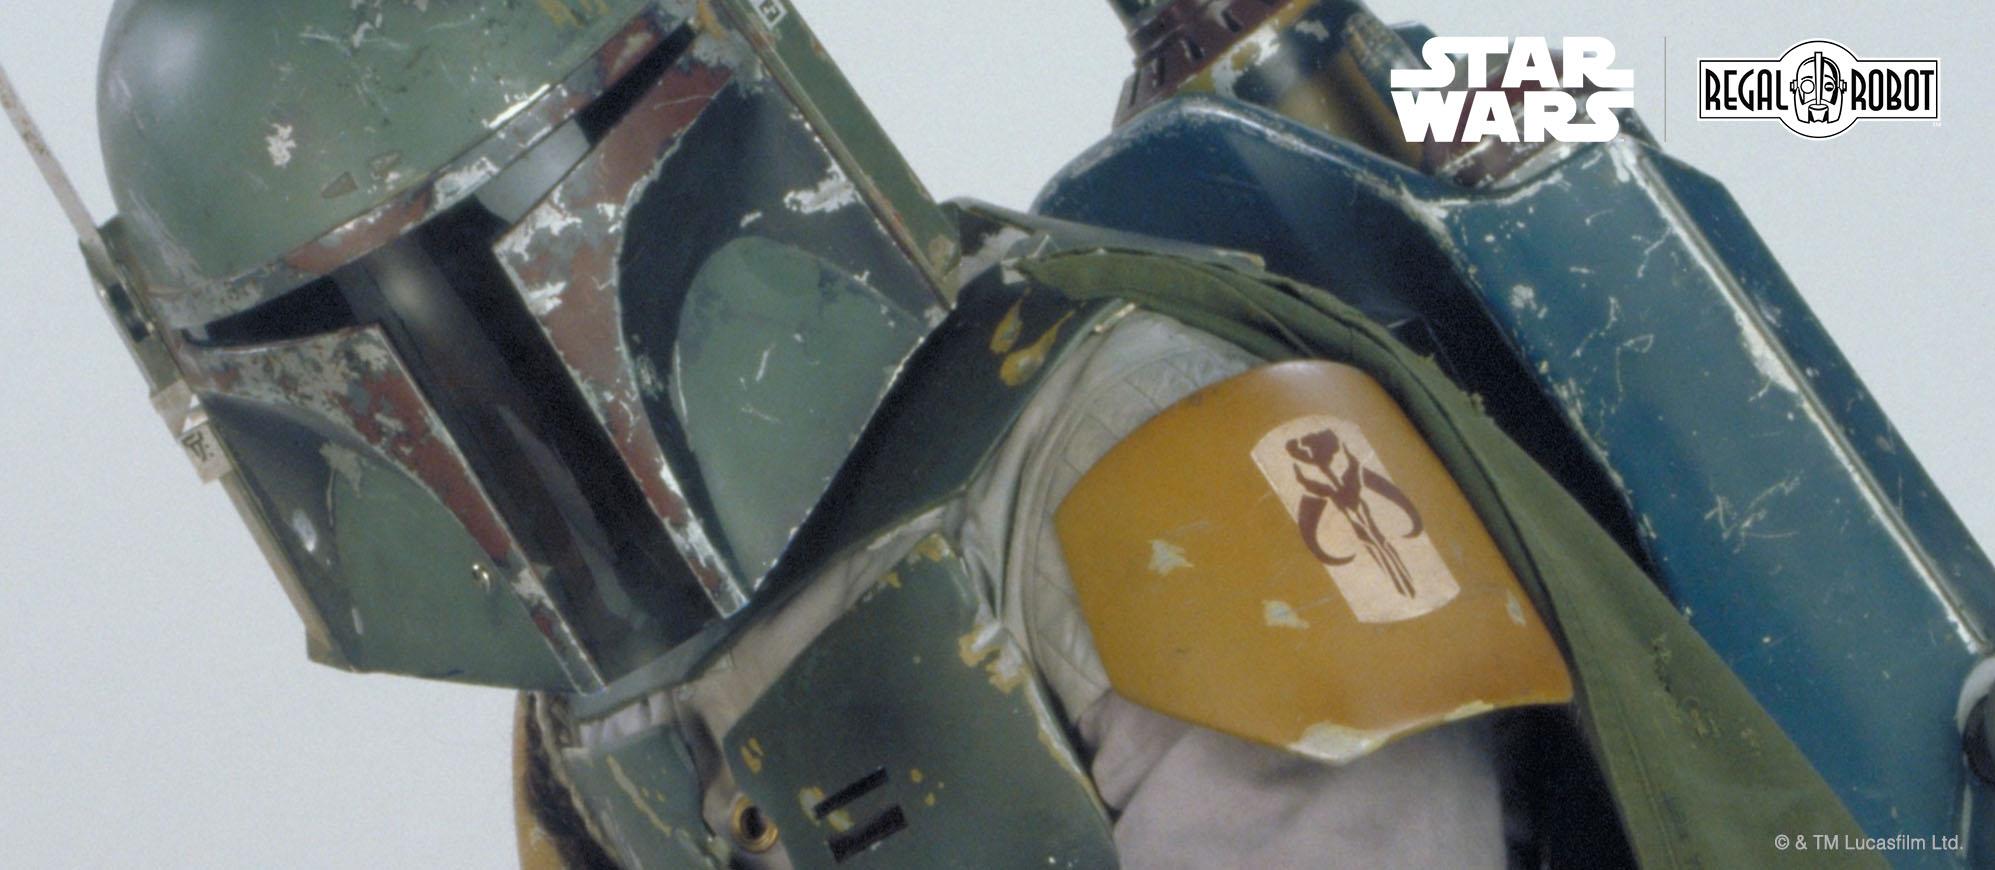 Boba Fett costume skull symbol